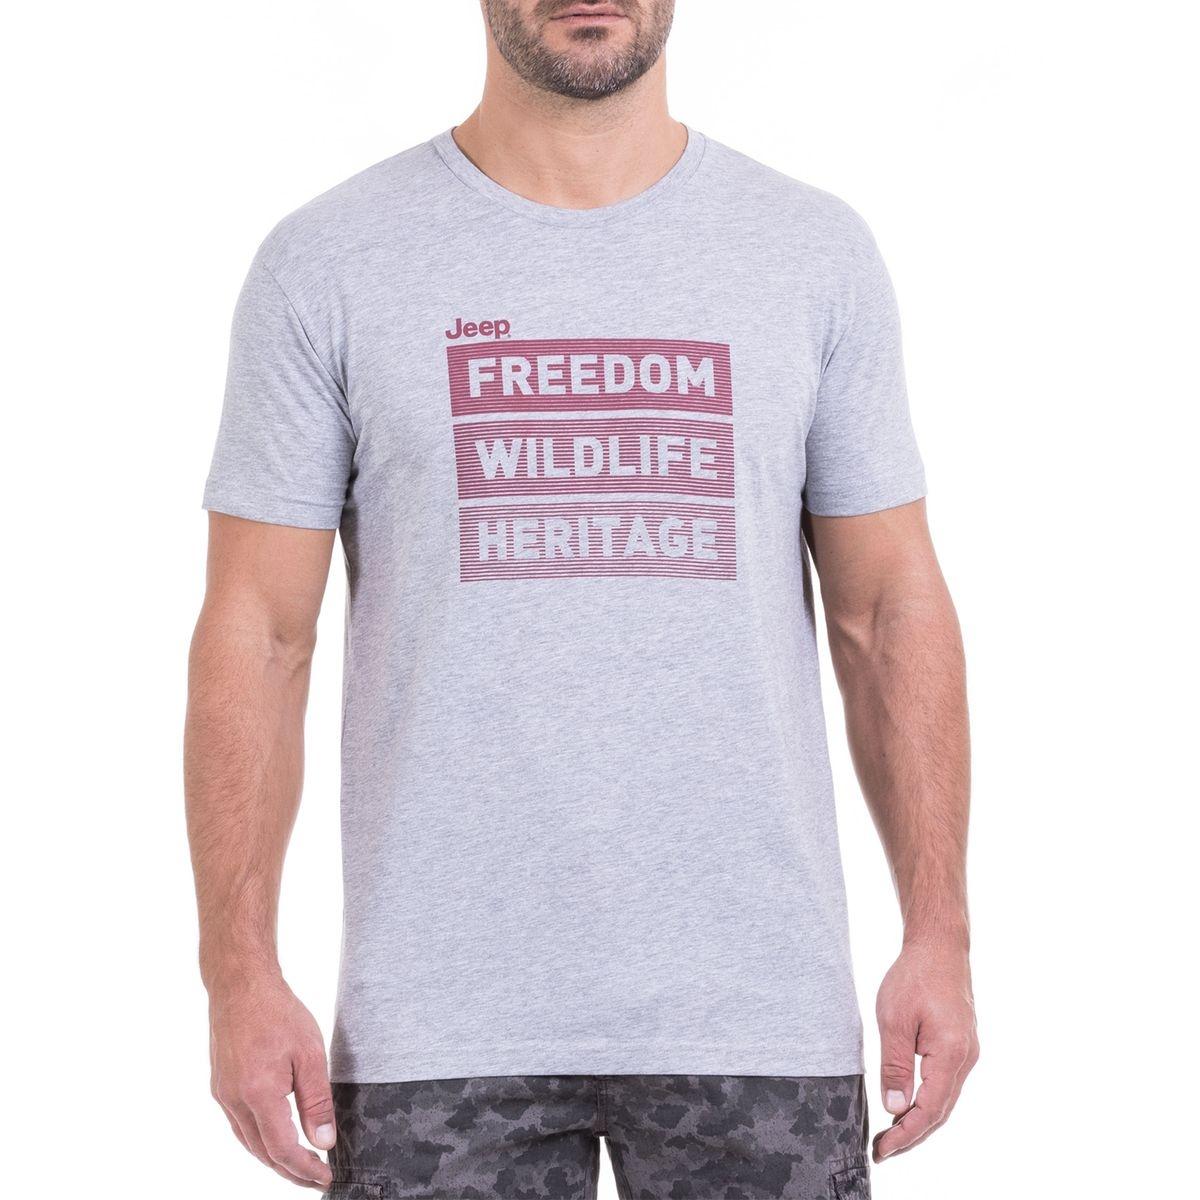 T-SHIRT  FREEDOM WILDLIFE HERITAGE  J9S